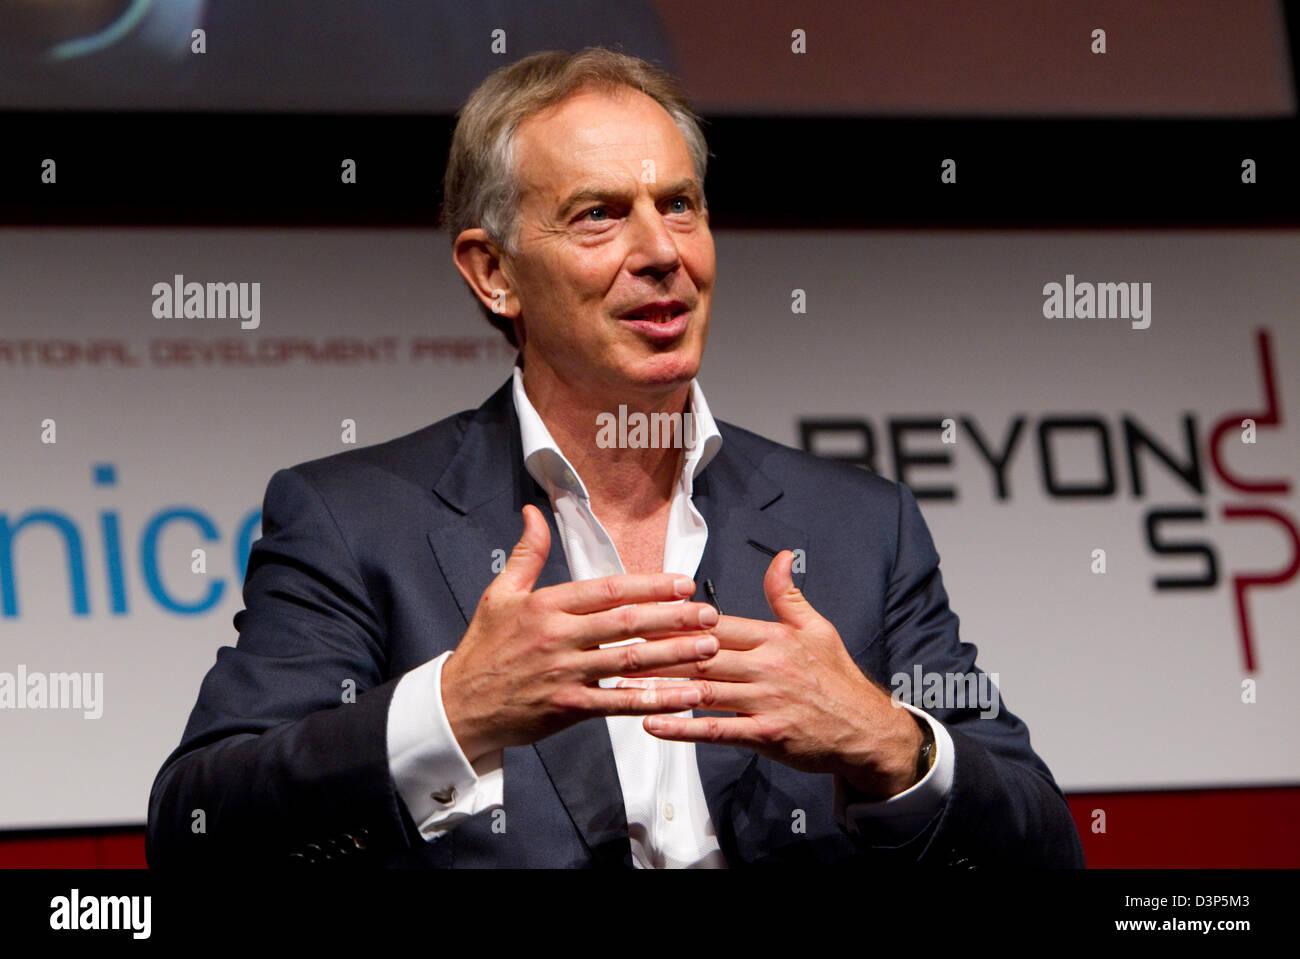 Tony Blair Former Prime Minister - Stock Image